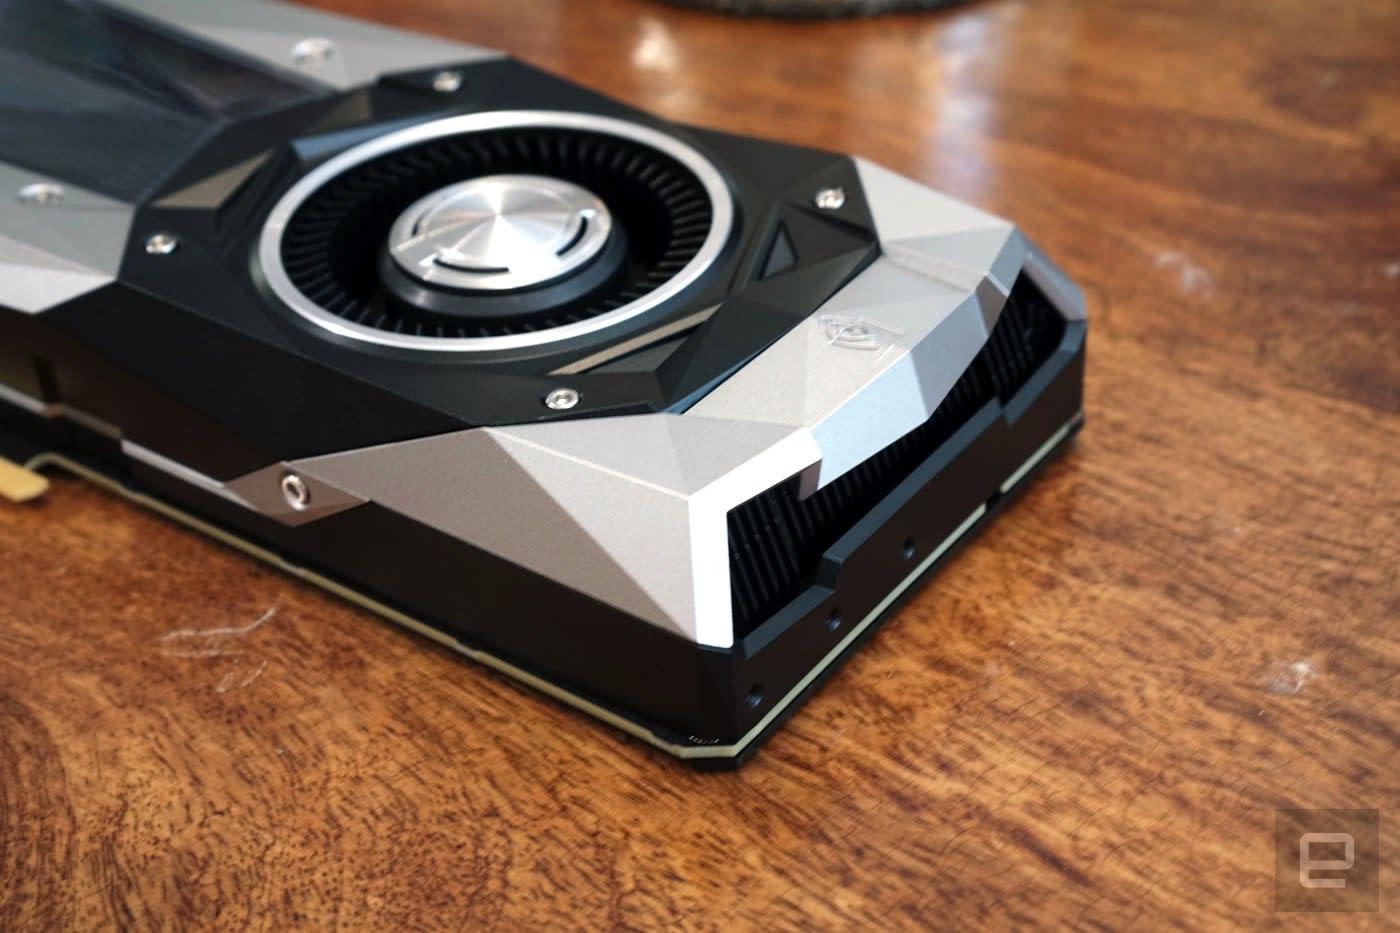 NVIDIA's GeForce GTX 1080 is a PC gamer's dream